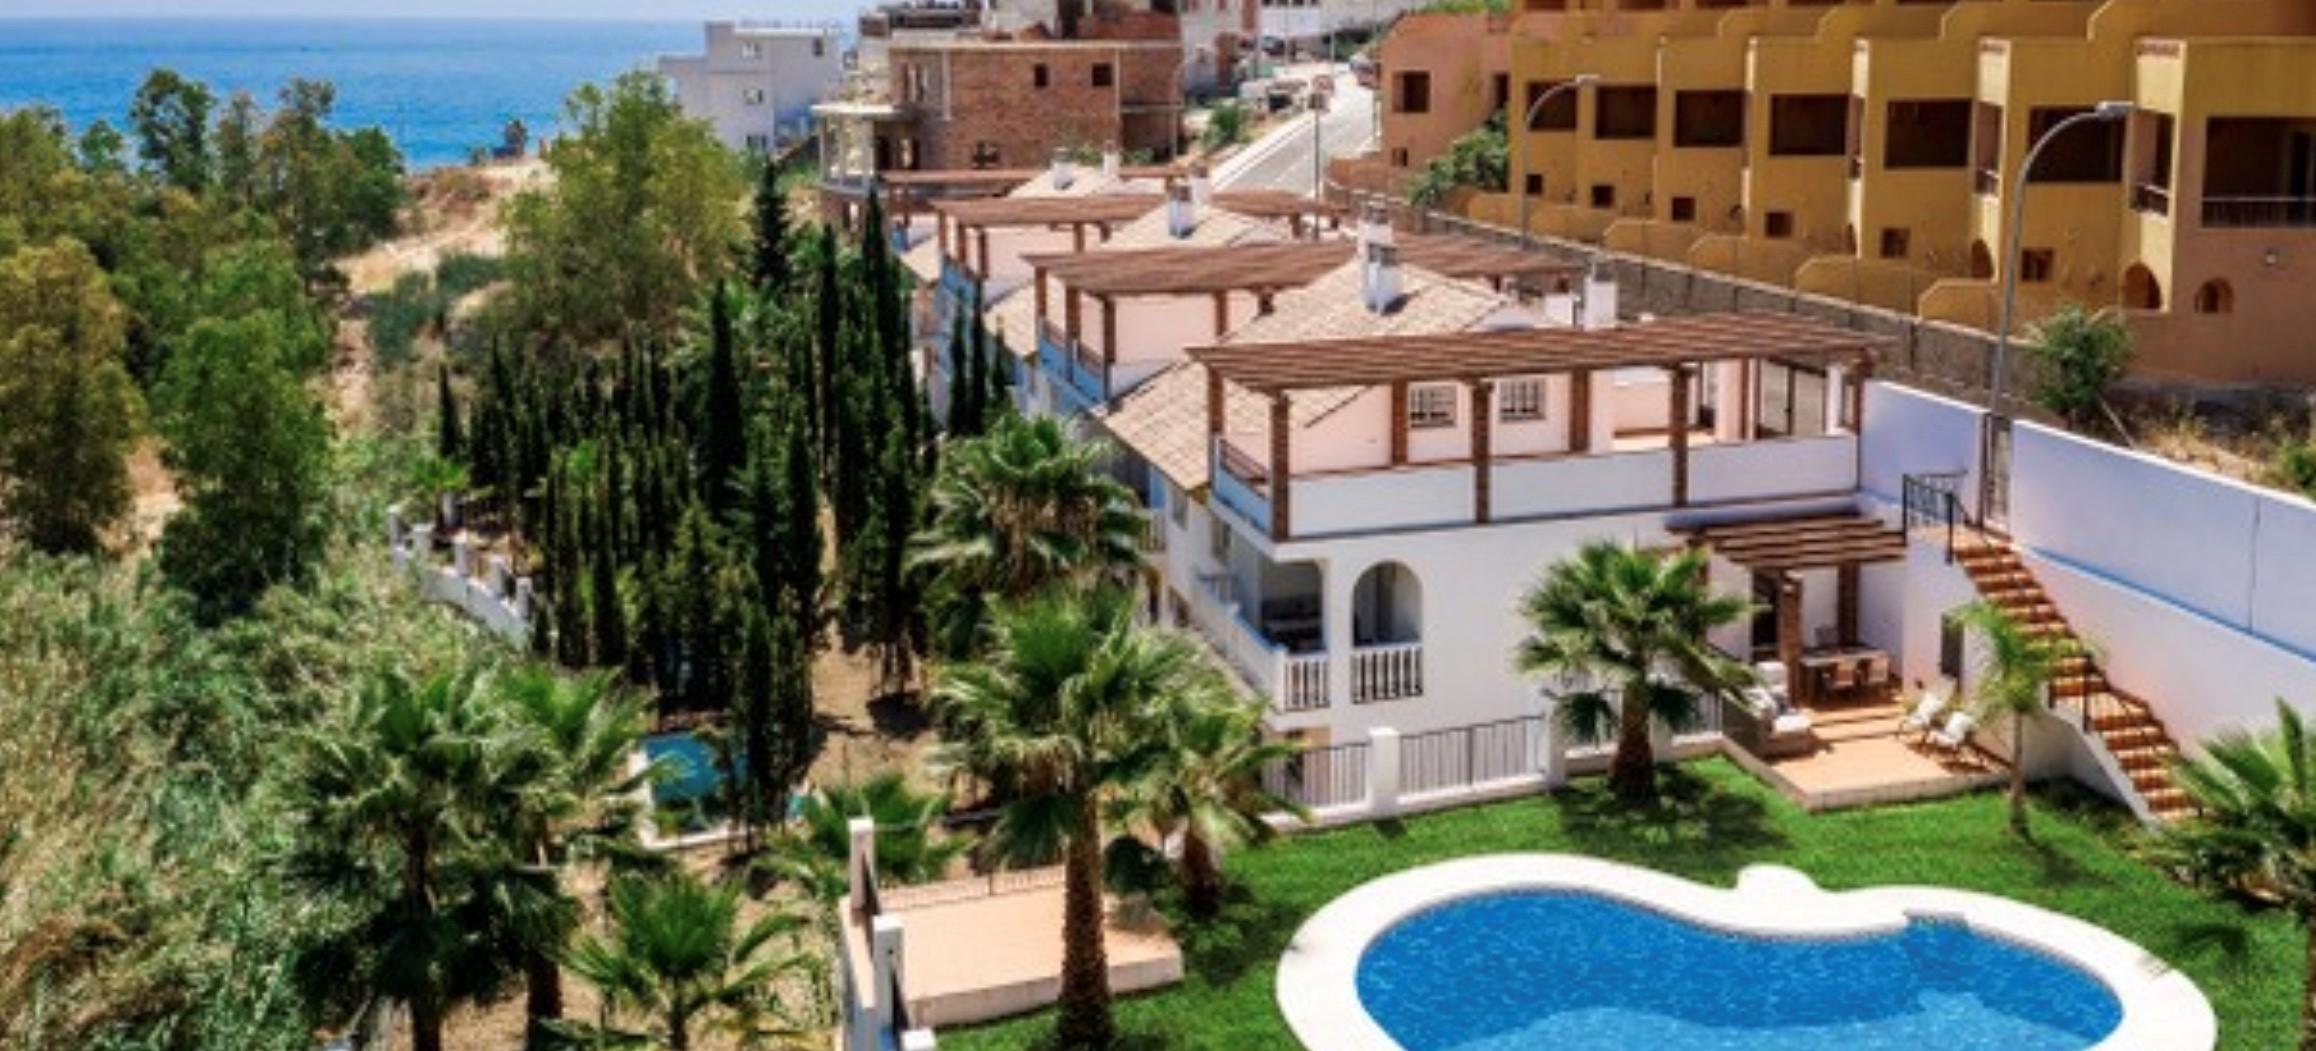 Benalmadena villa €305.000